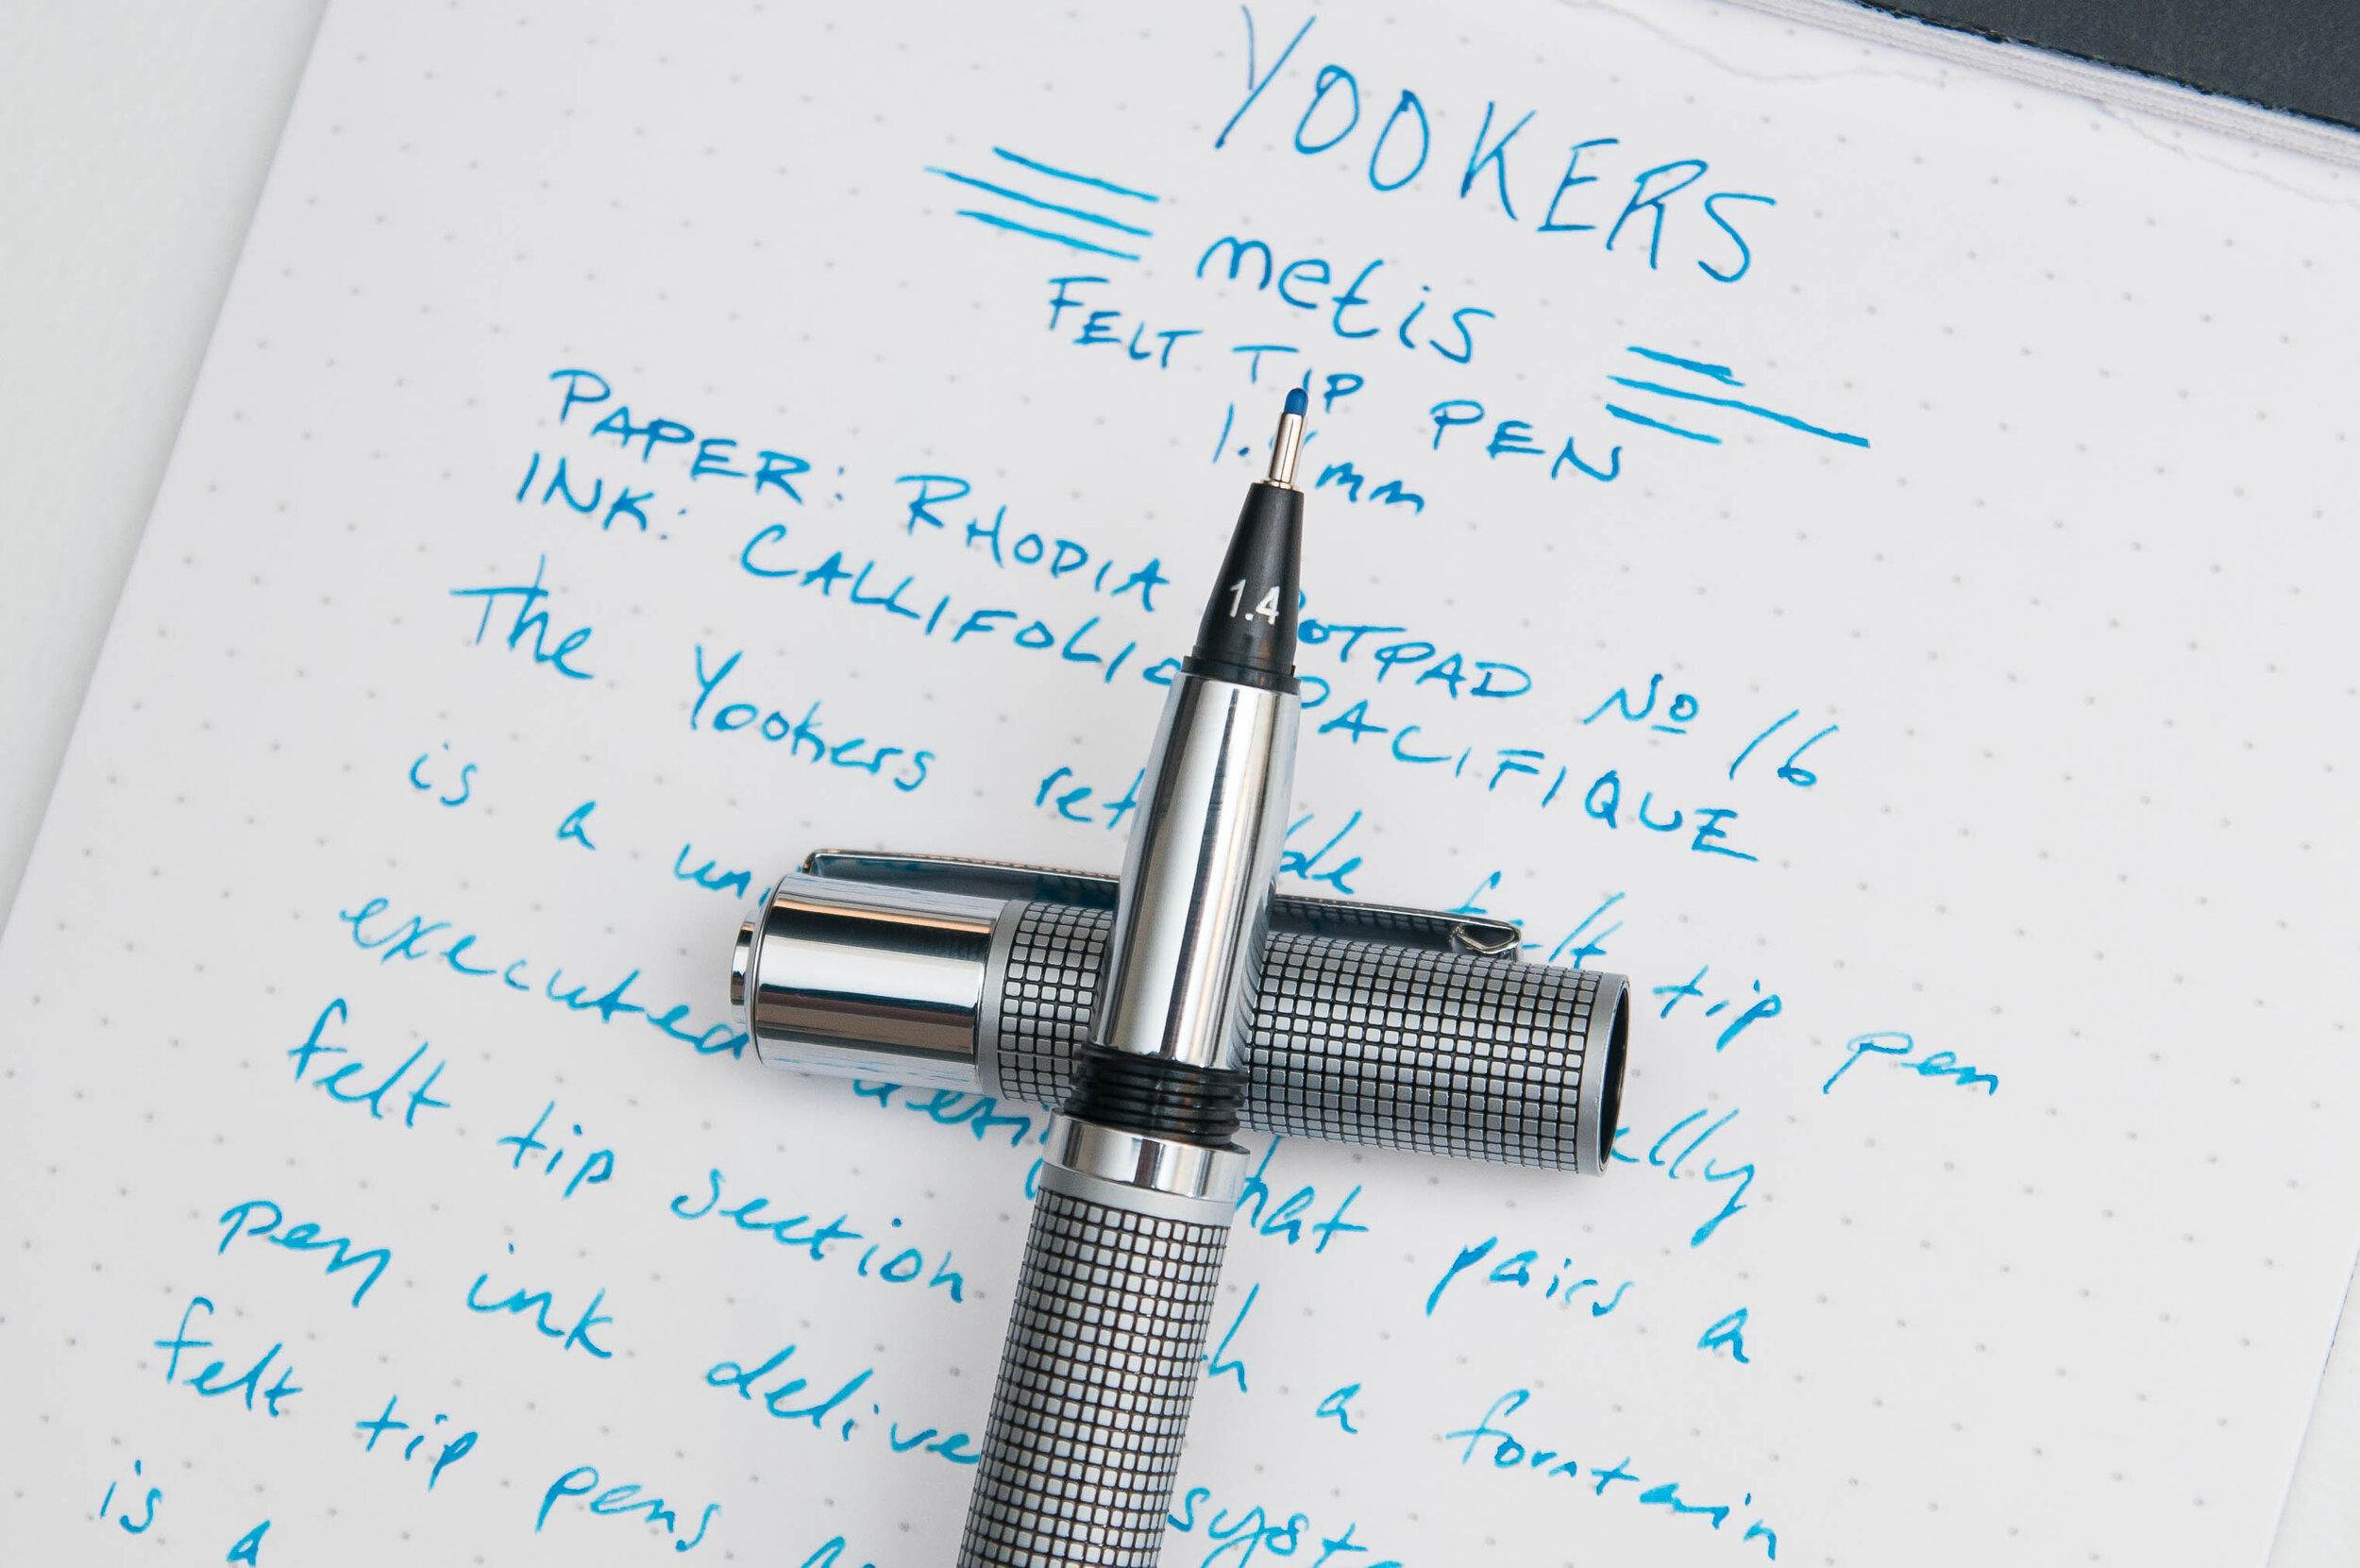 Yookers Metis Felt-tip Pen Tip